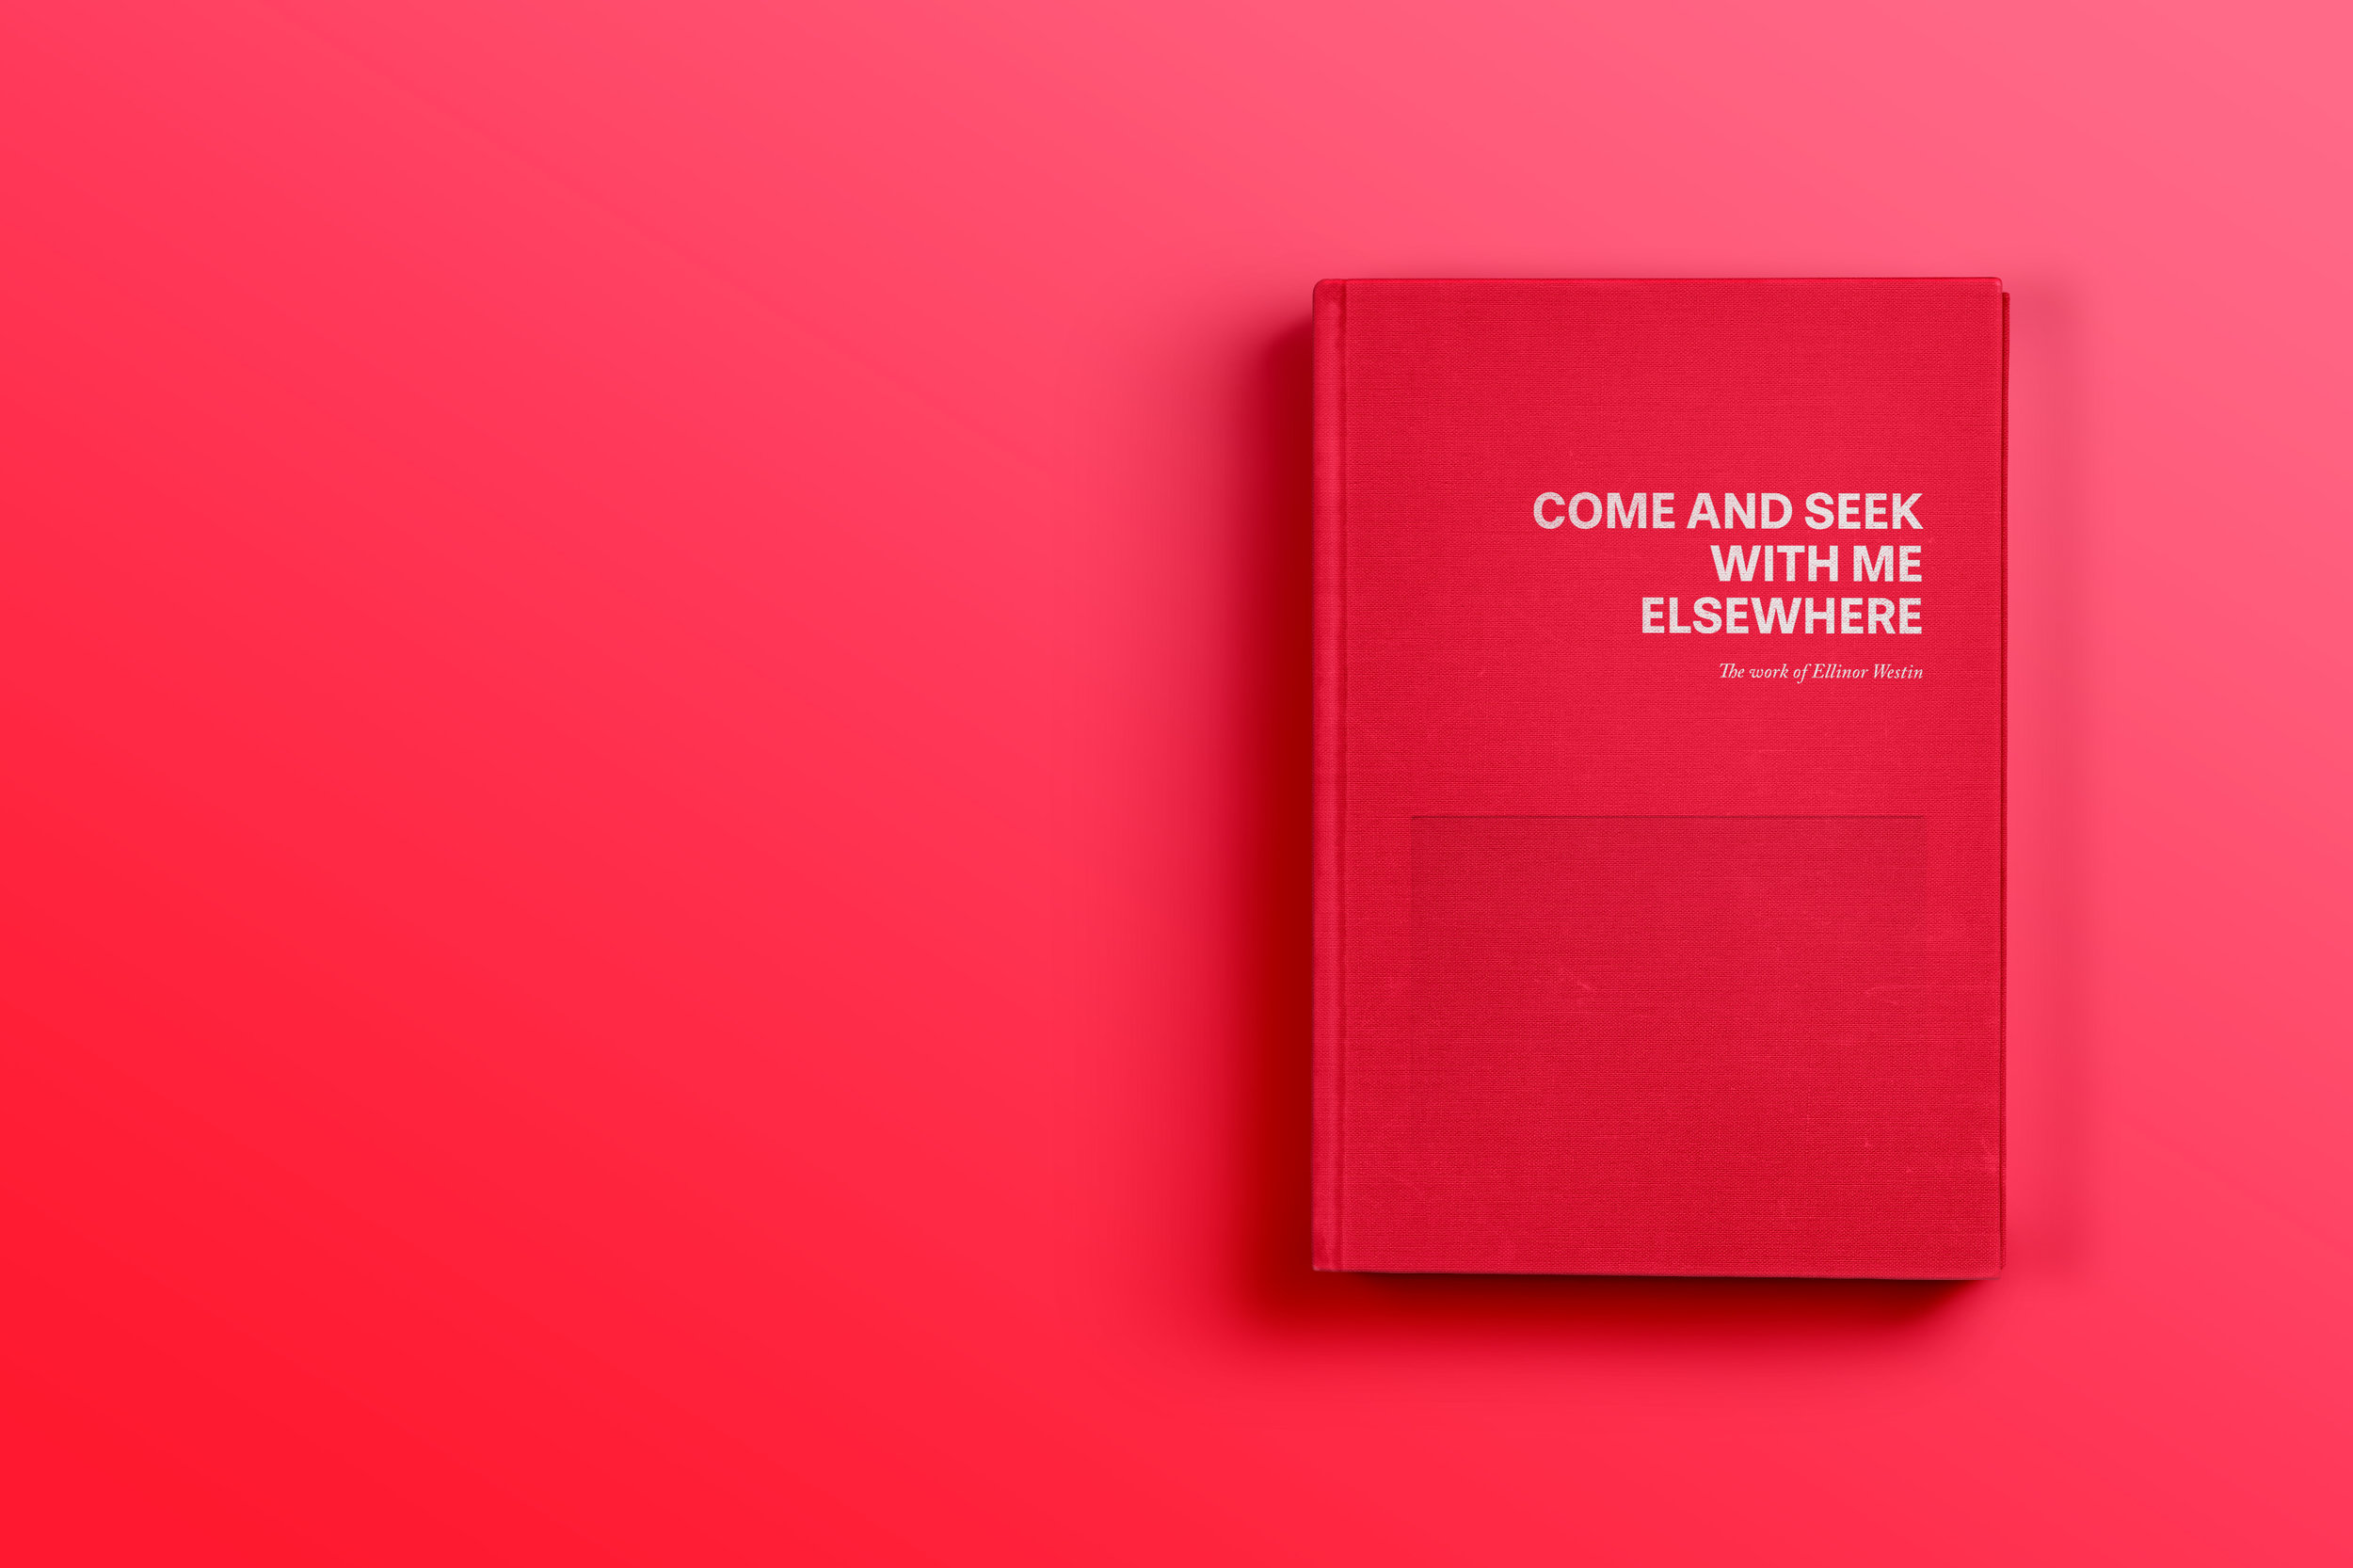 001-Cover-book.jpg